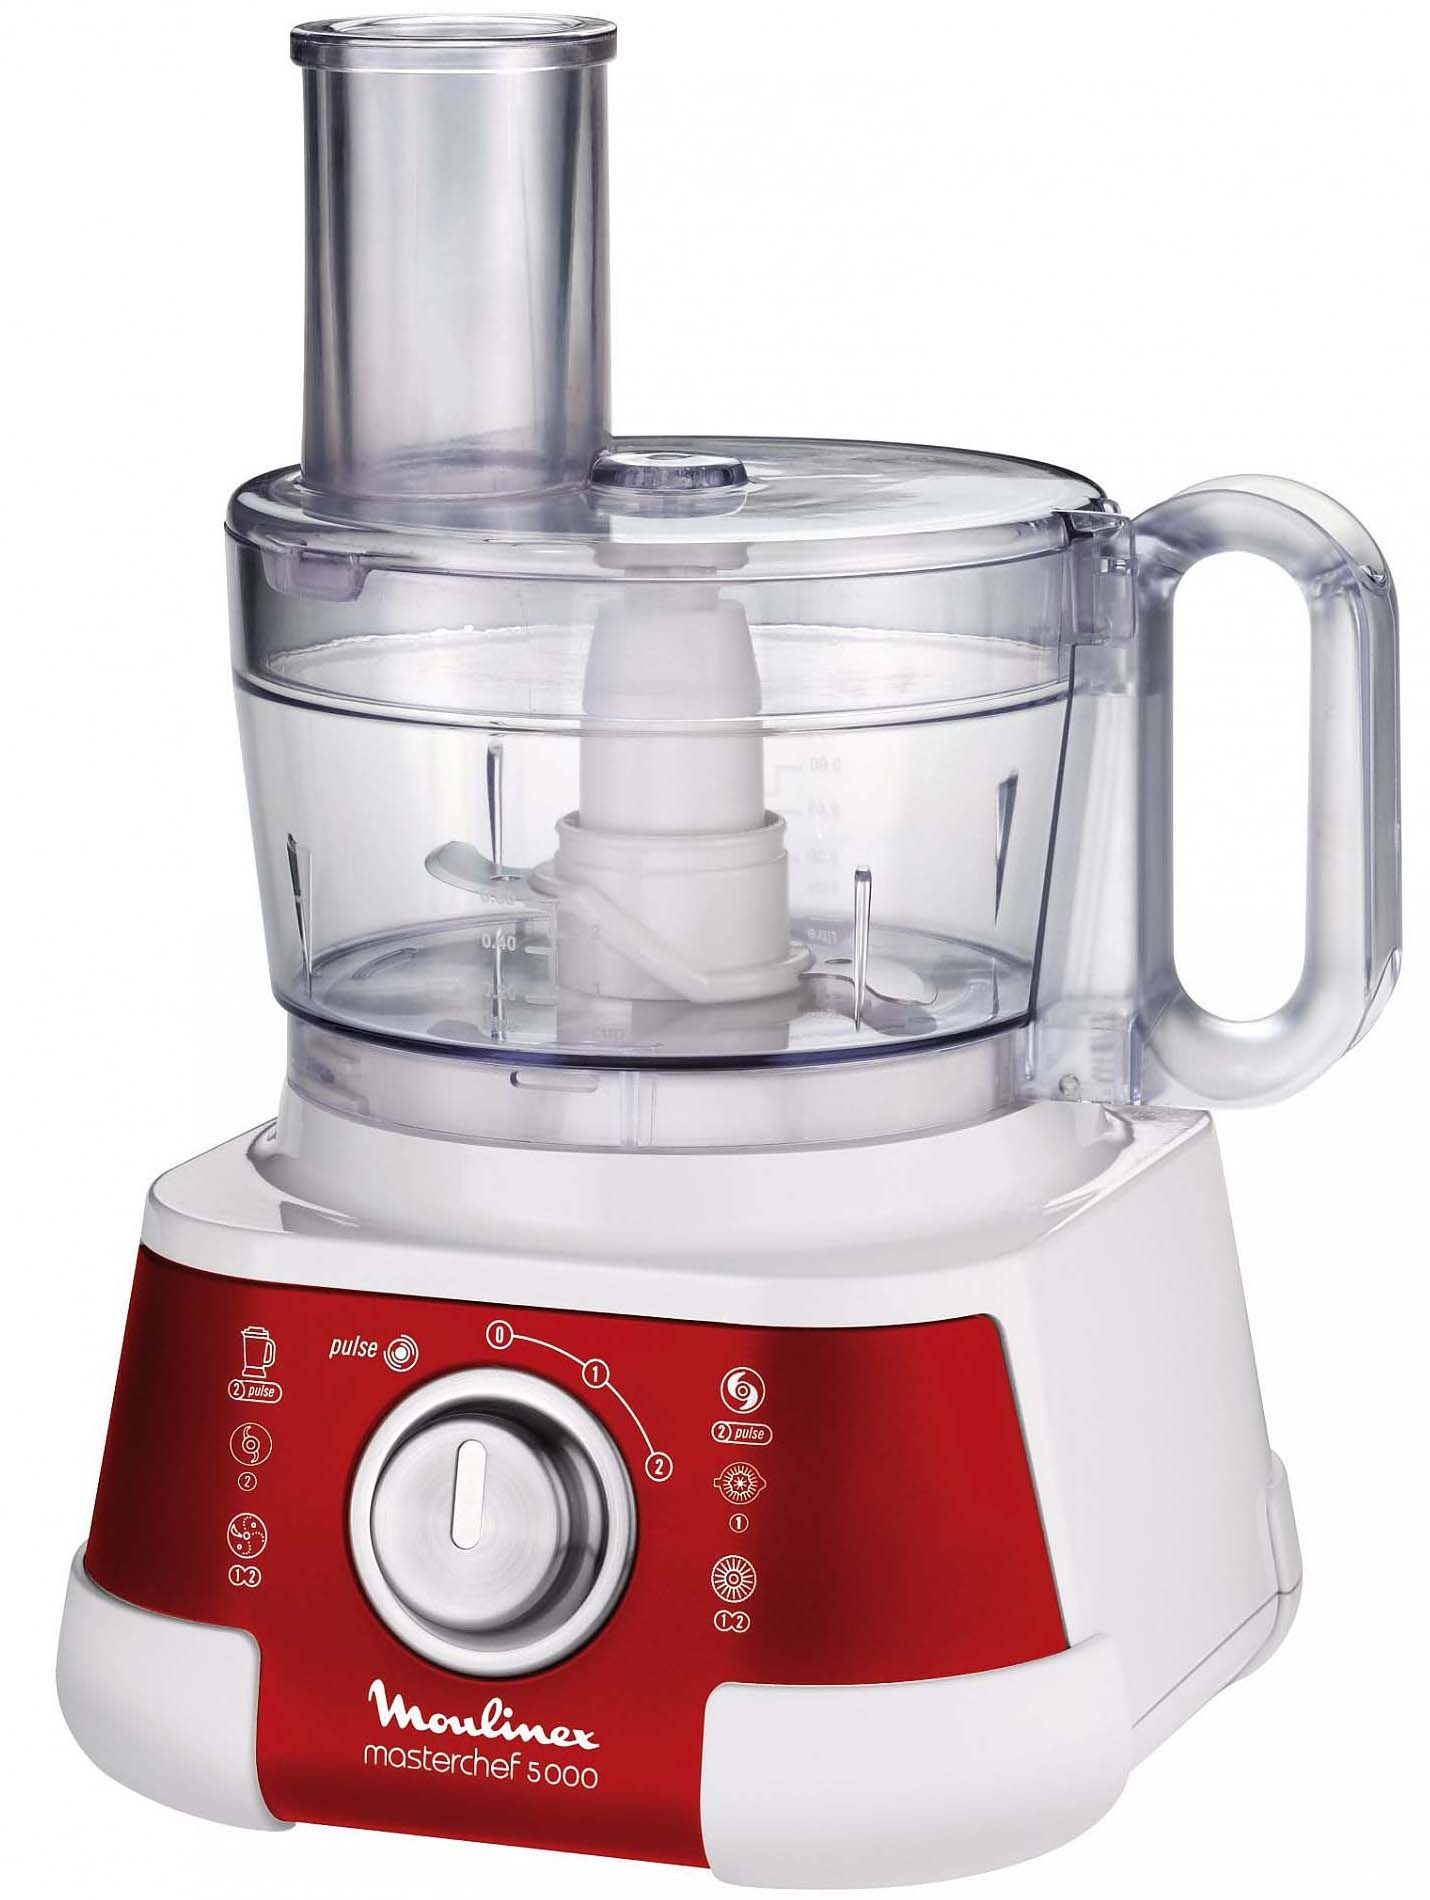 Moulinex masterchef 5000 fp520g la recensione del robot - Robot da cucina masterchef ...